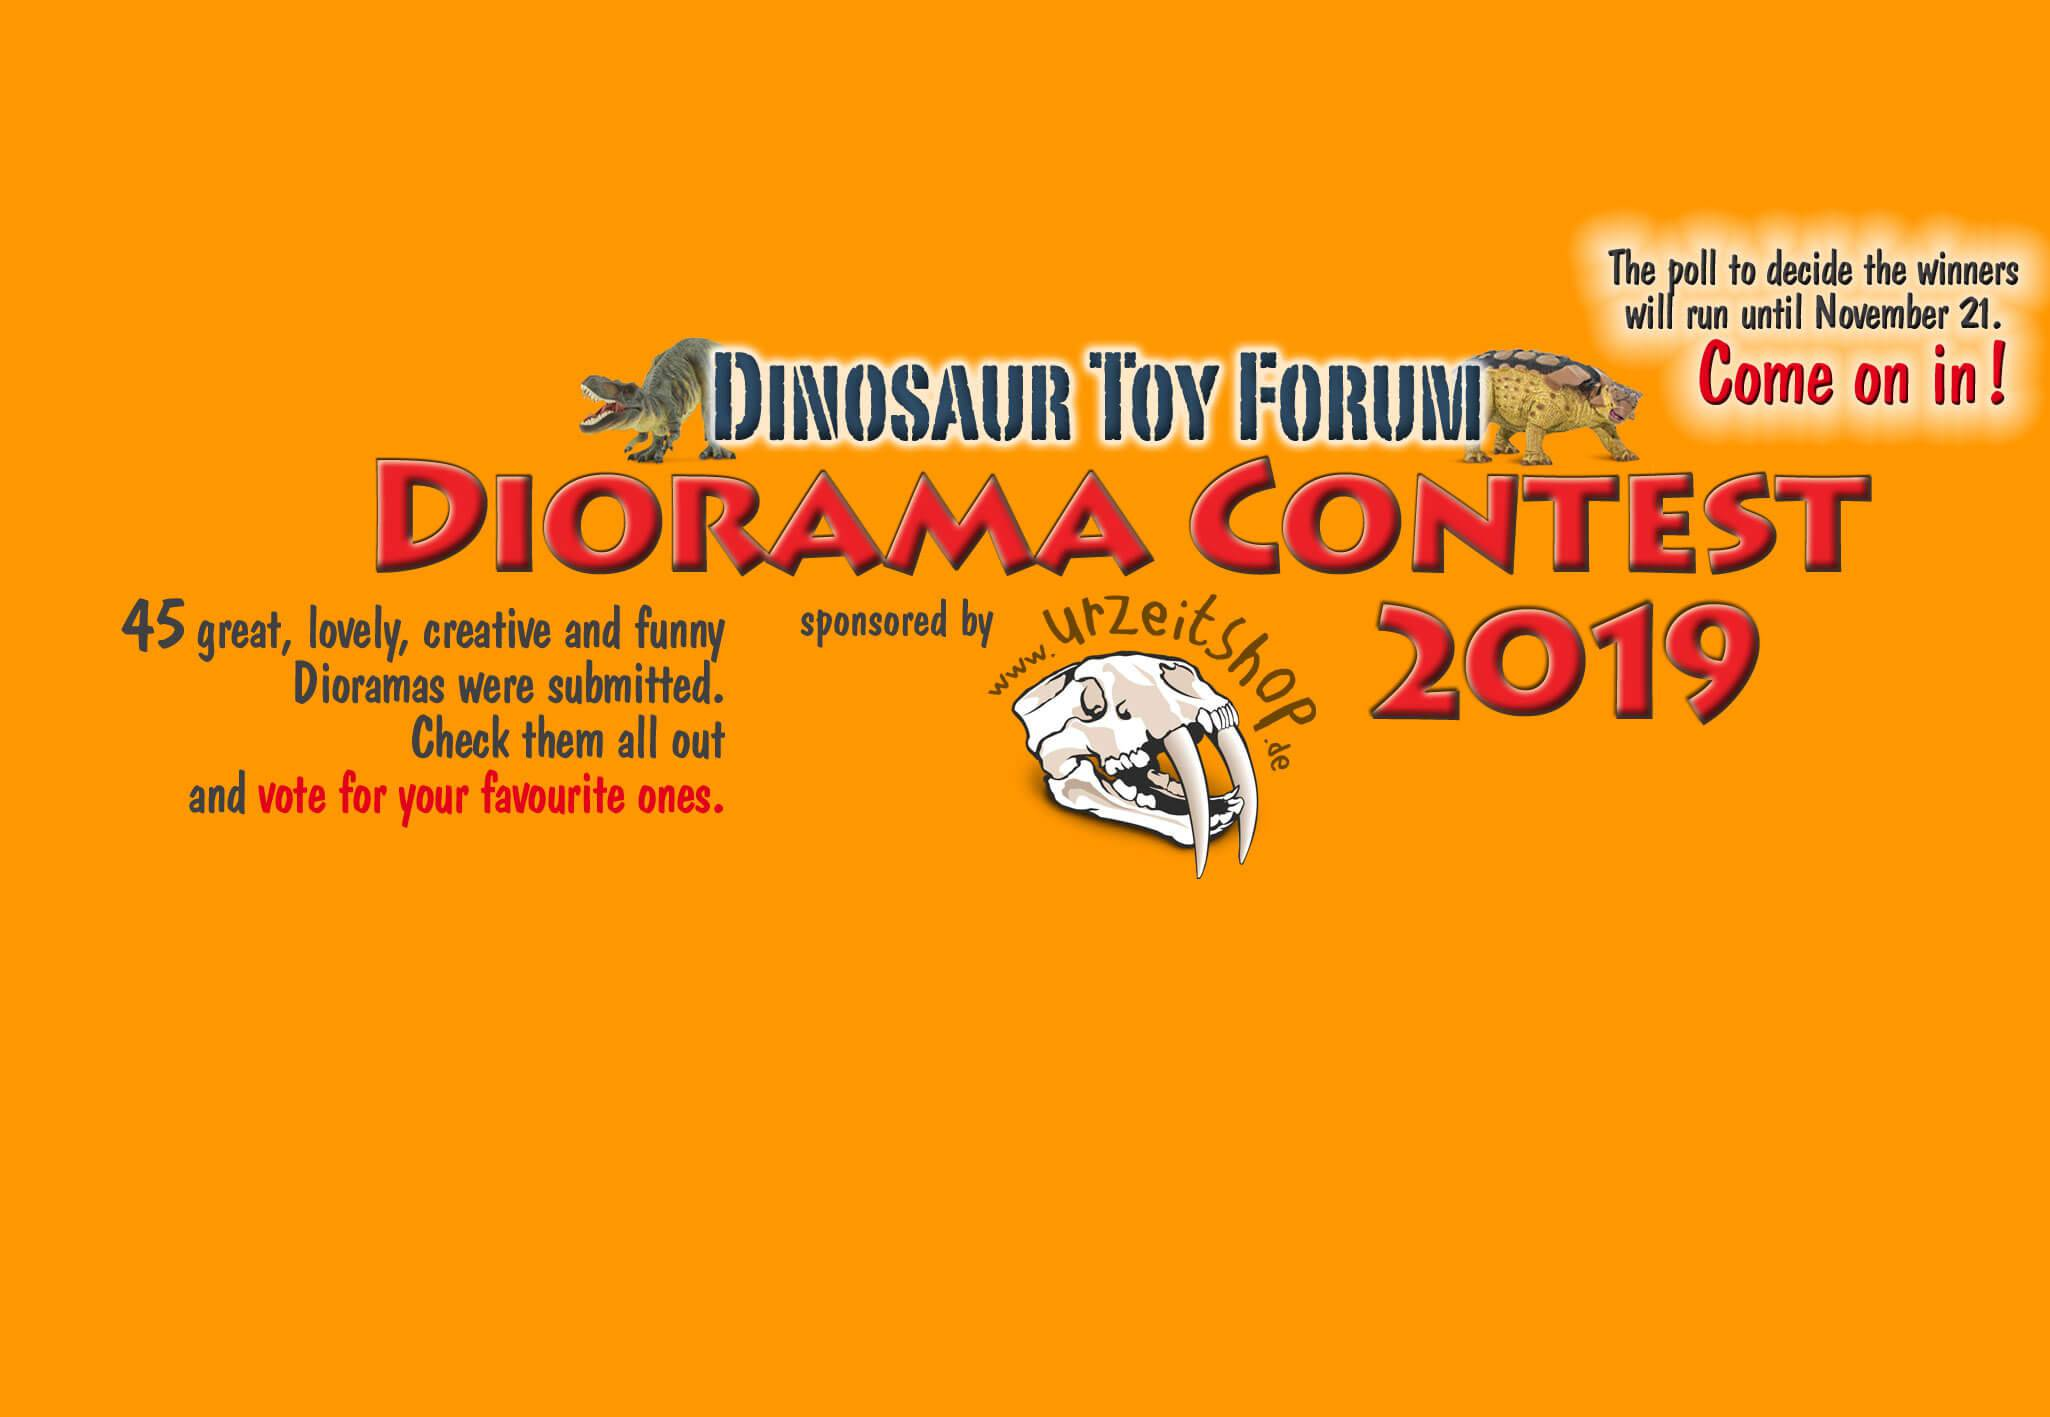 Diorama Contest Poll